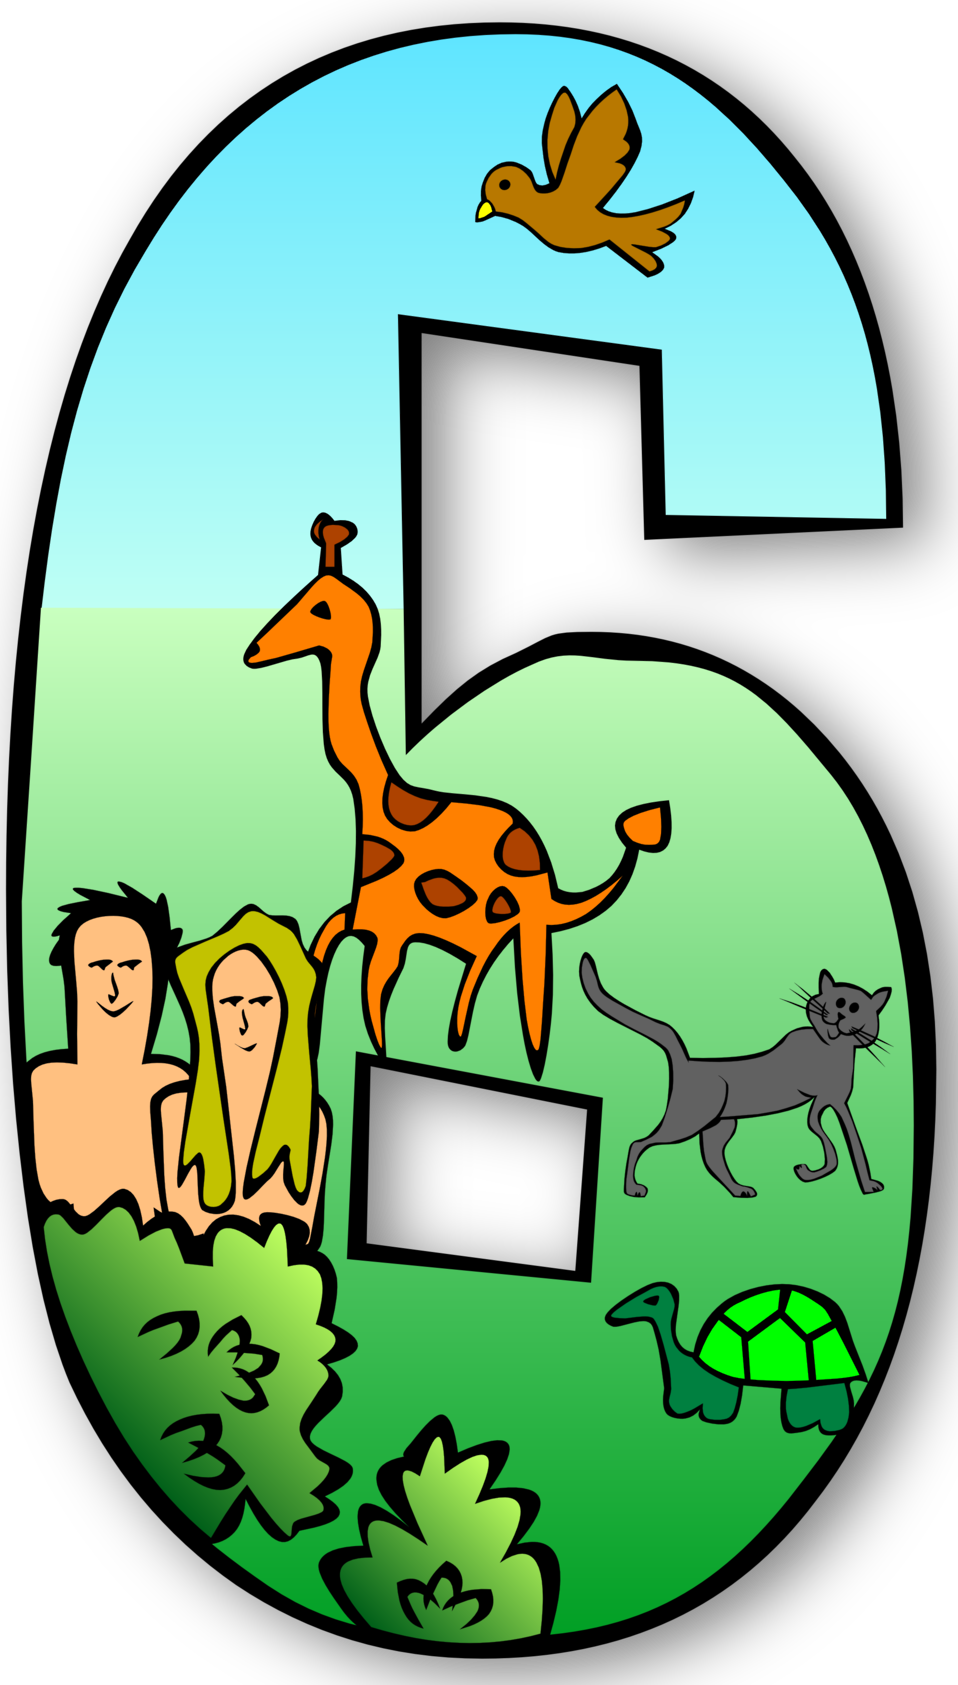 Number 6 clipart creation number. Public domain clip art